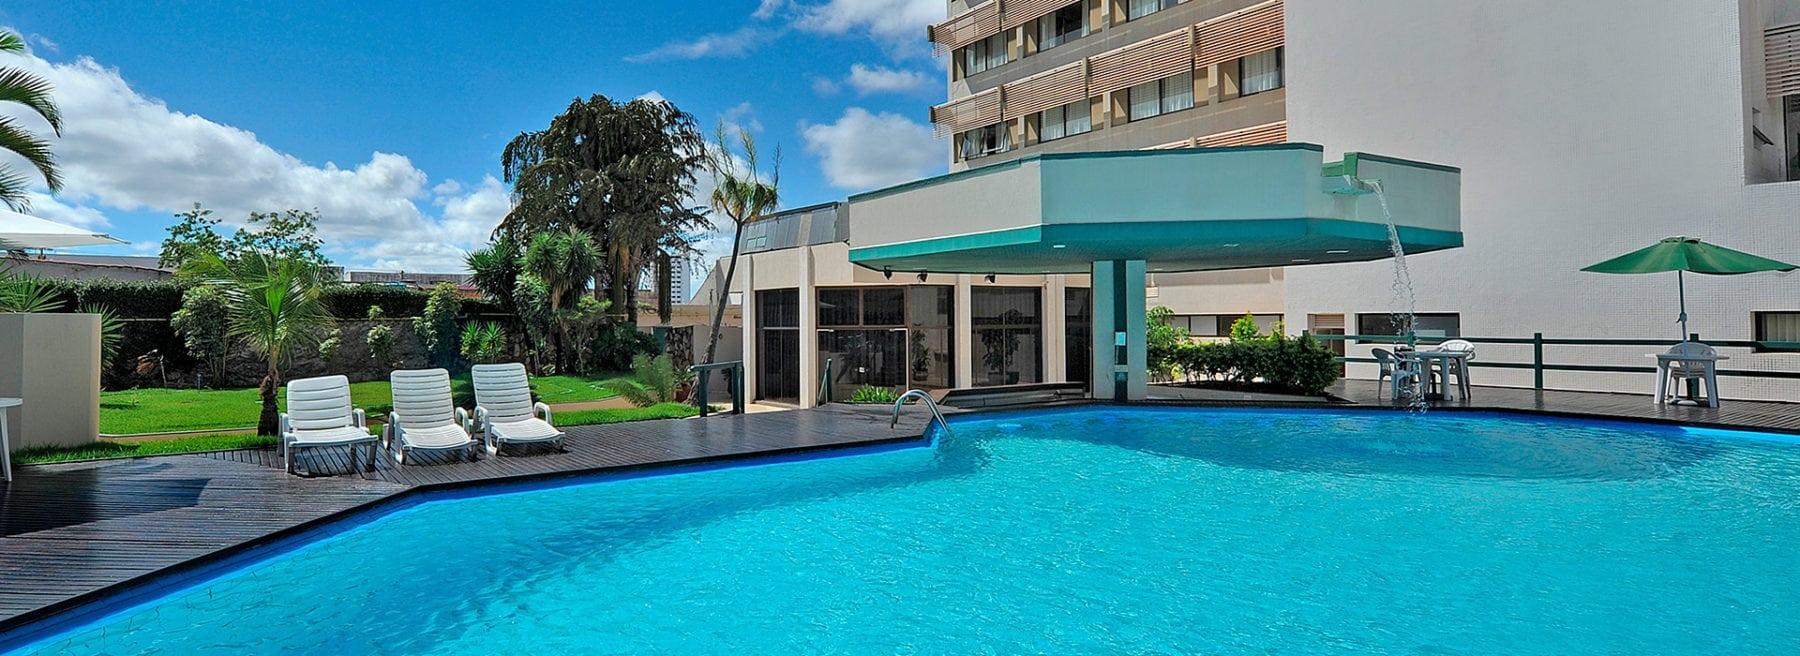 Deville Prime Cuiaba Pool